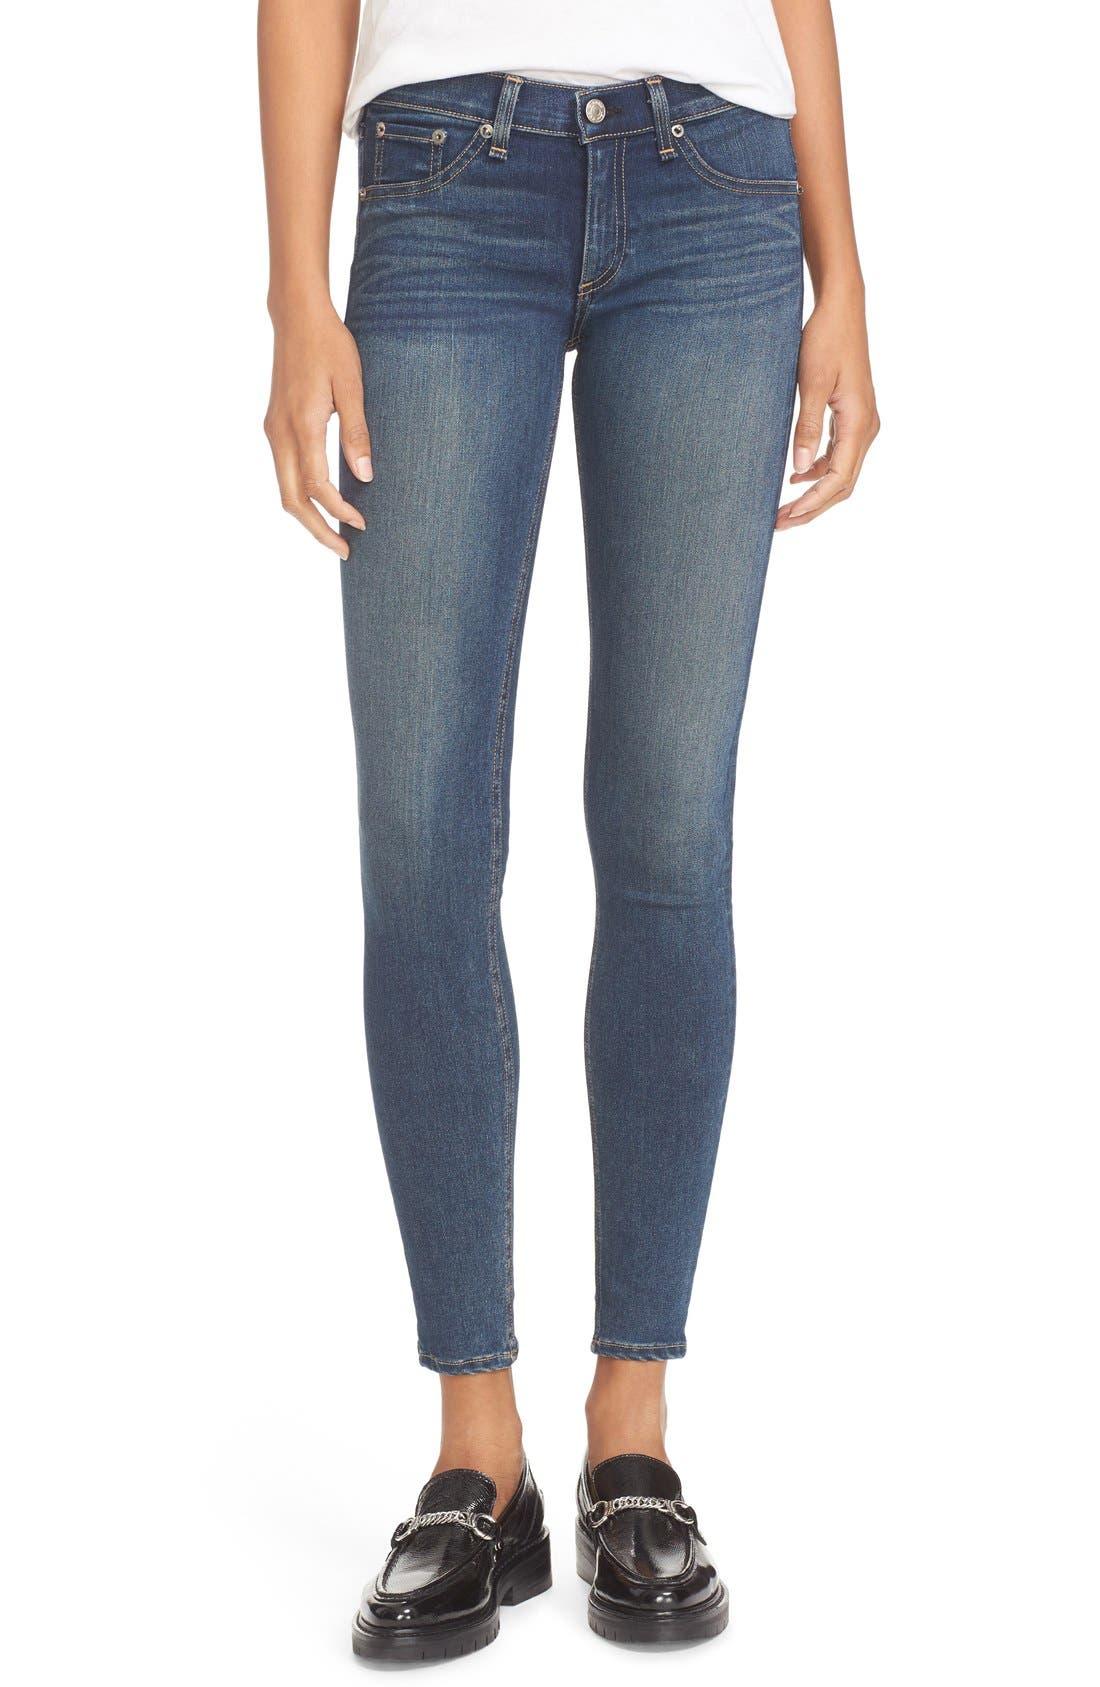 Alternate Image 1 Selected - rag & bone/JEAN Skinny Jeans (Joshua)